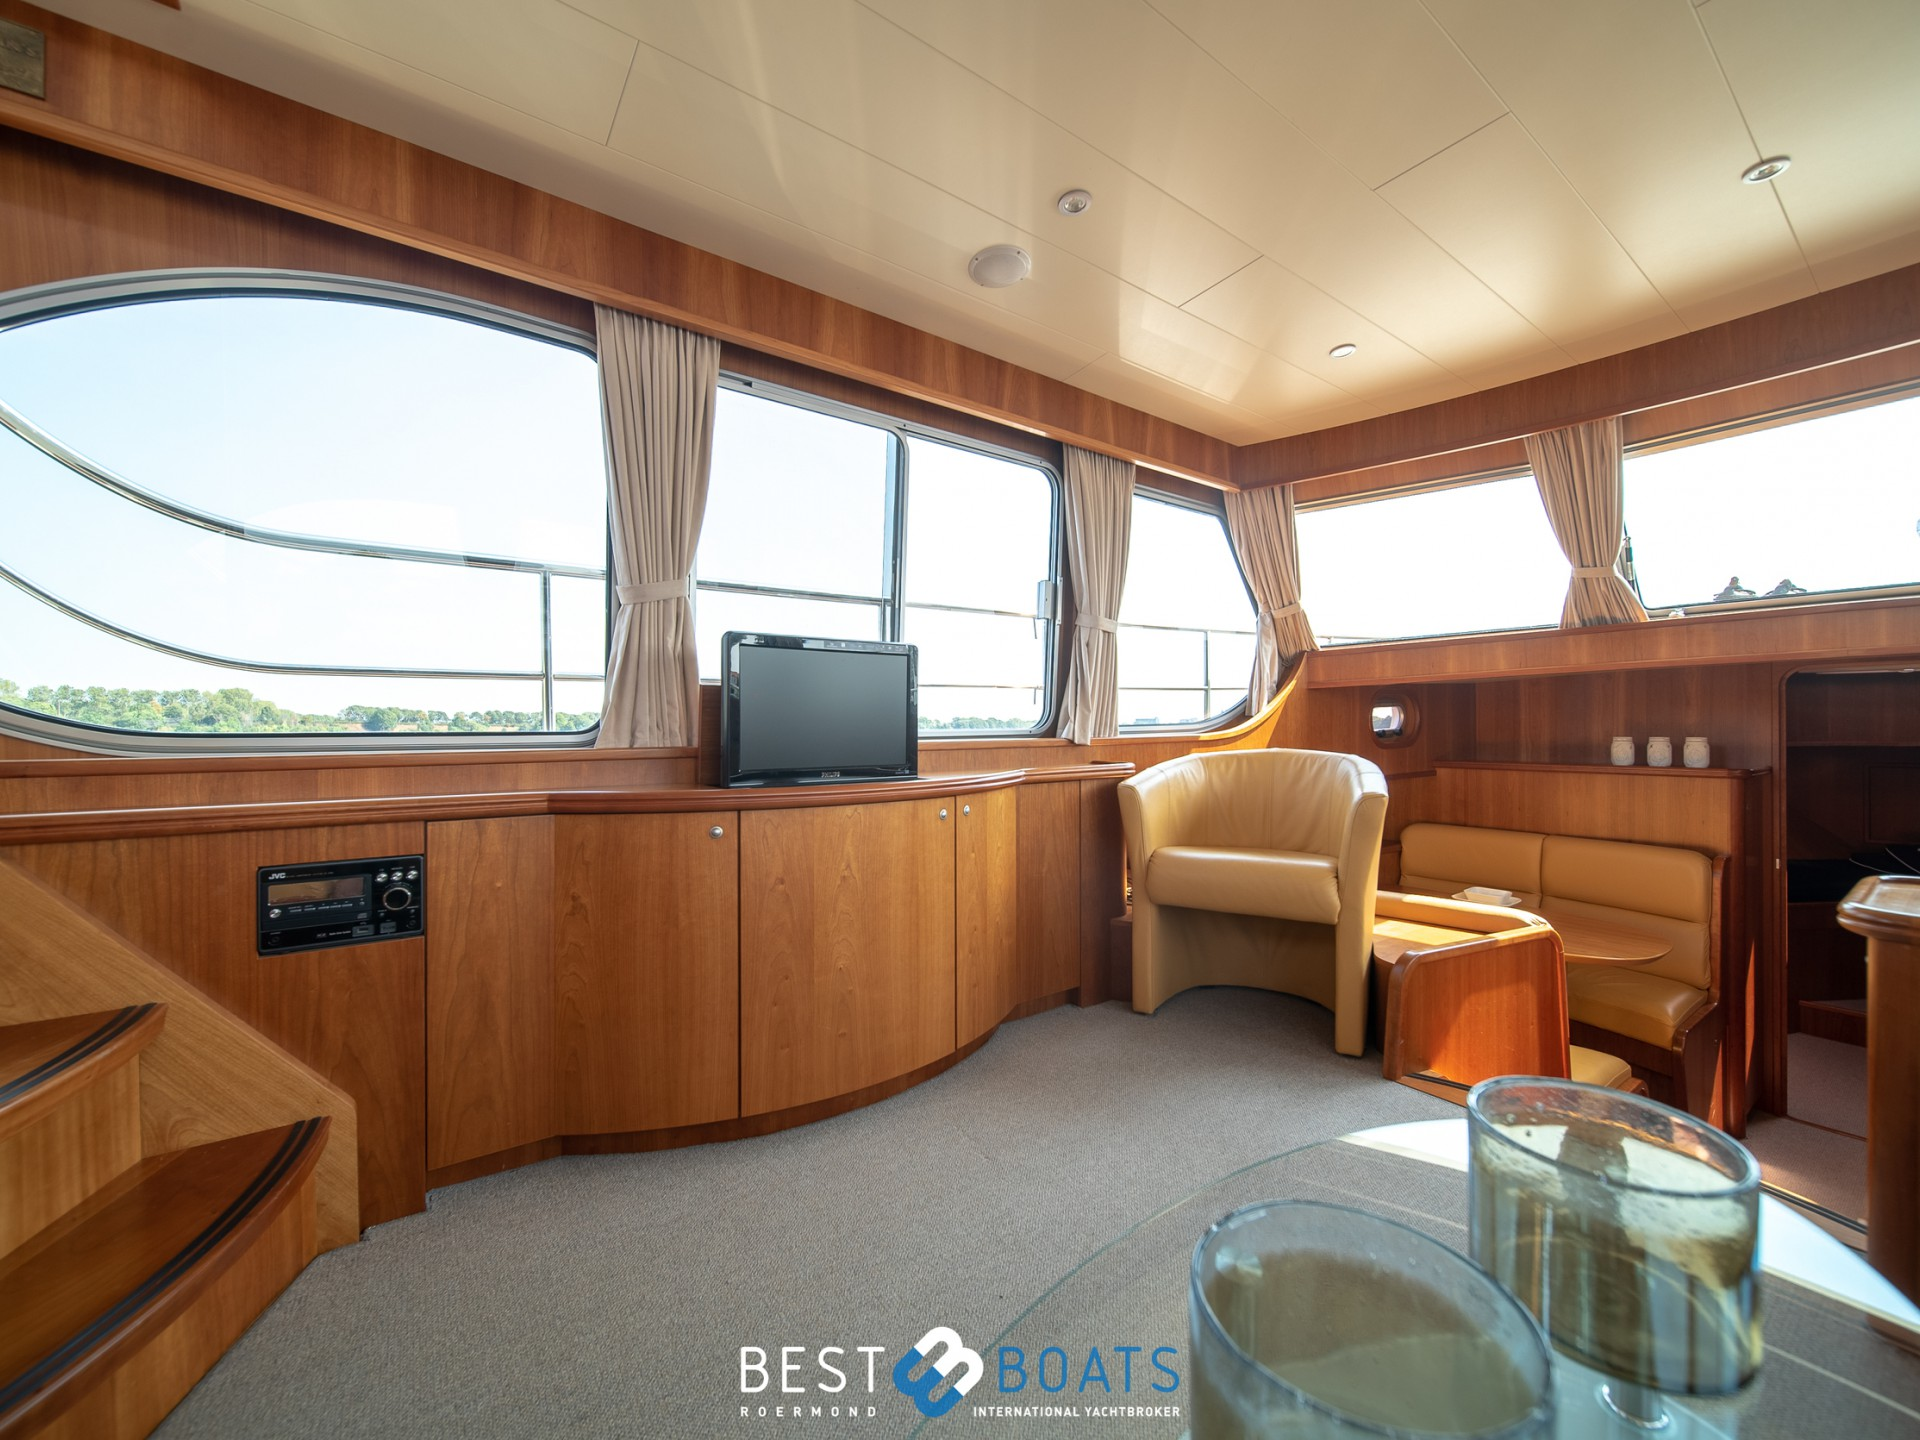 Linskens Classic Cruiser 46